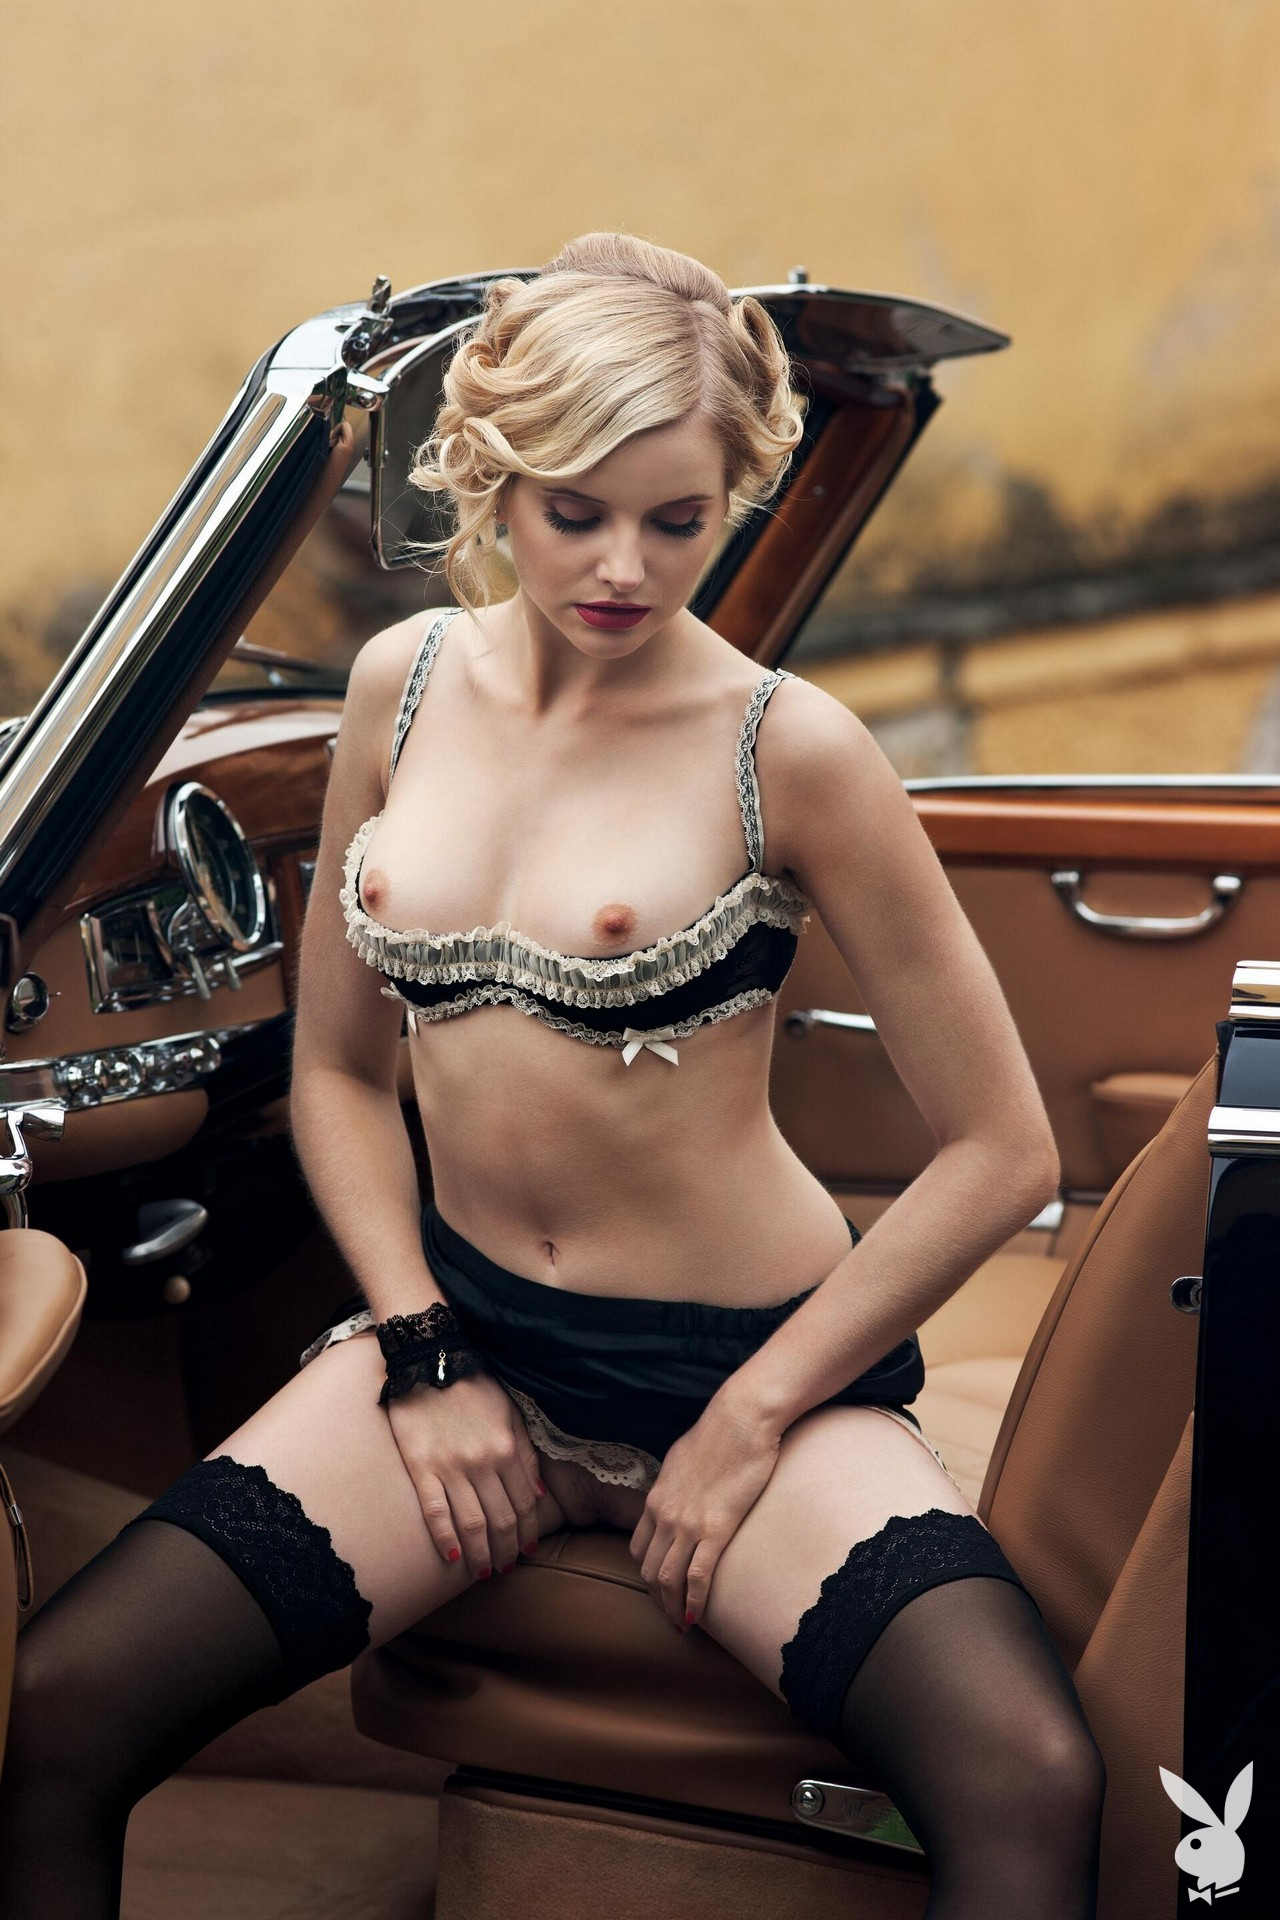 Anna and Lisa Heyse - Playboy photoshoot